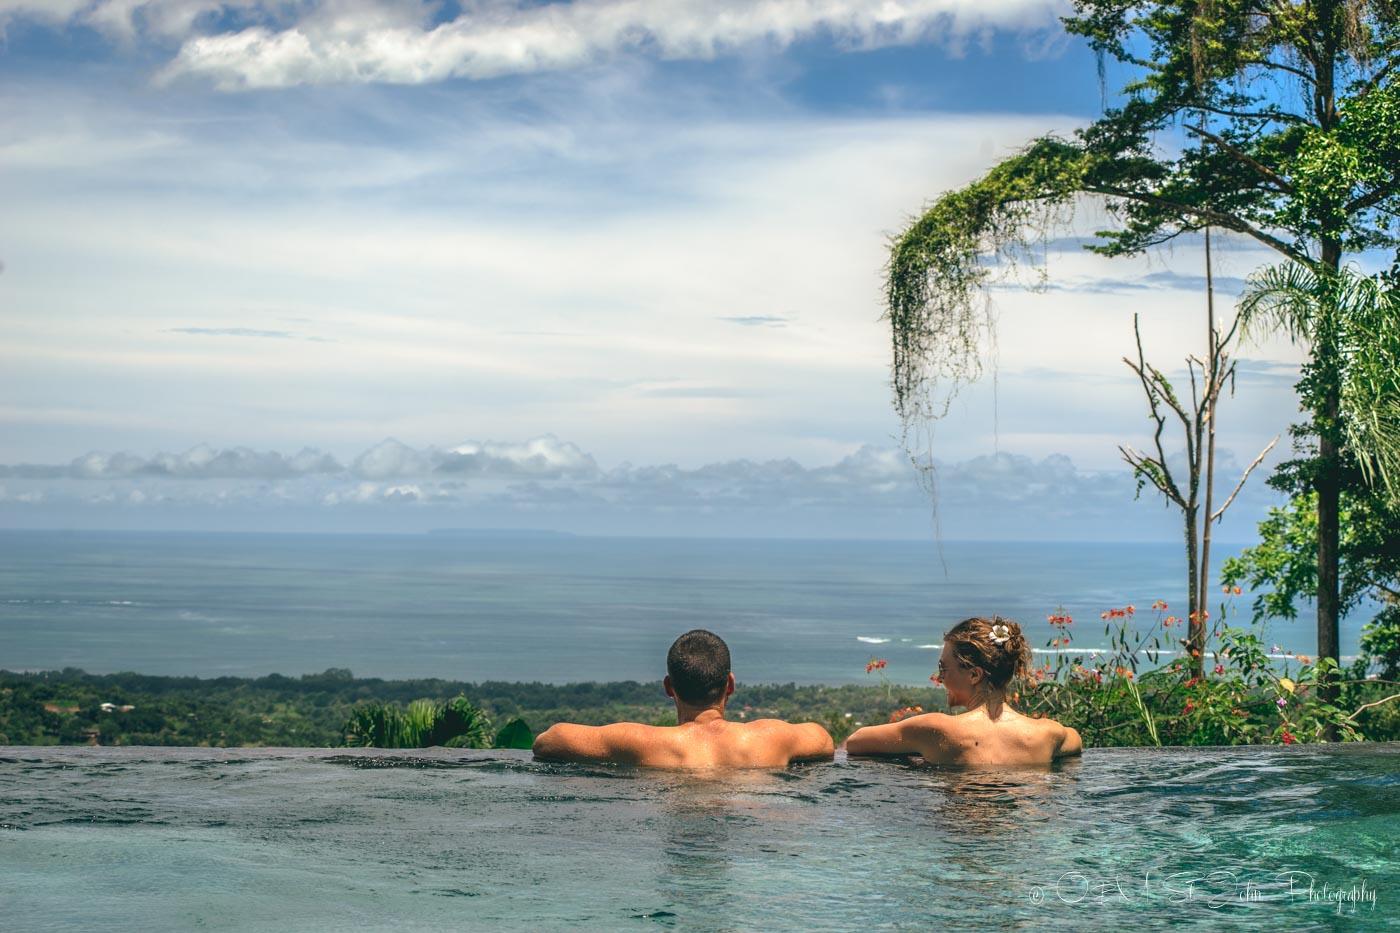 Max & Oksana in Infinity Pool at Oxygen Jungle Villas in Uvita, Costa Rica